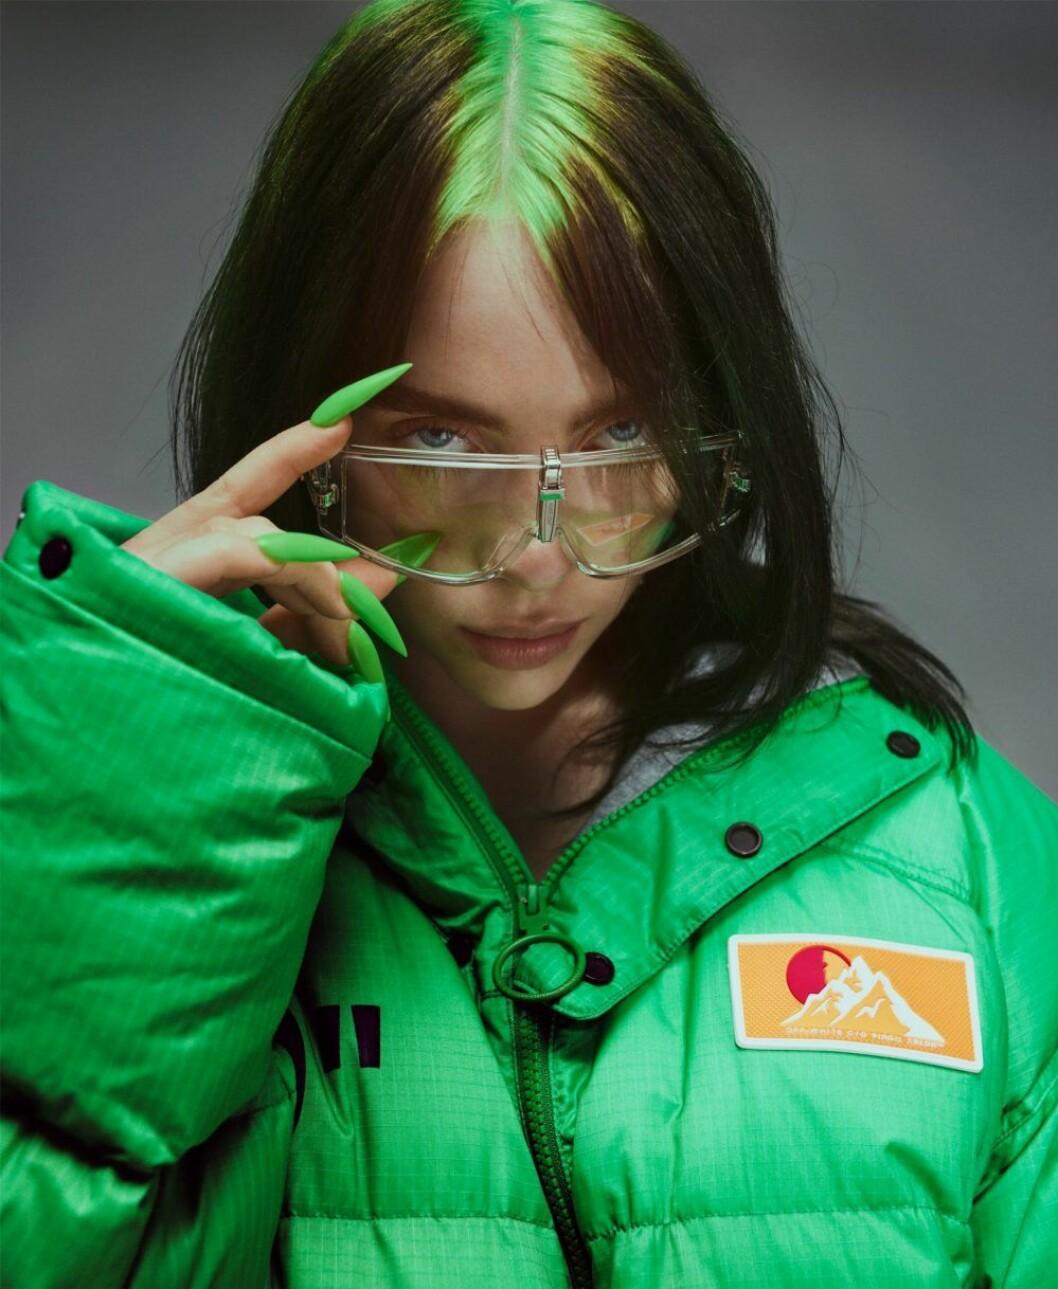 Billie Eilish i exklusiv intervju i ELLE, neongrön dunjacka från Off-White